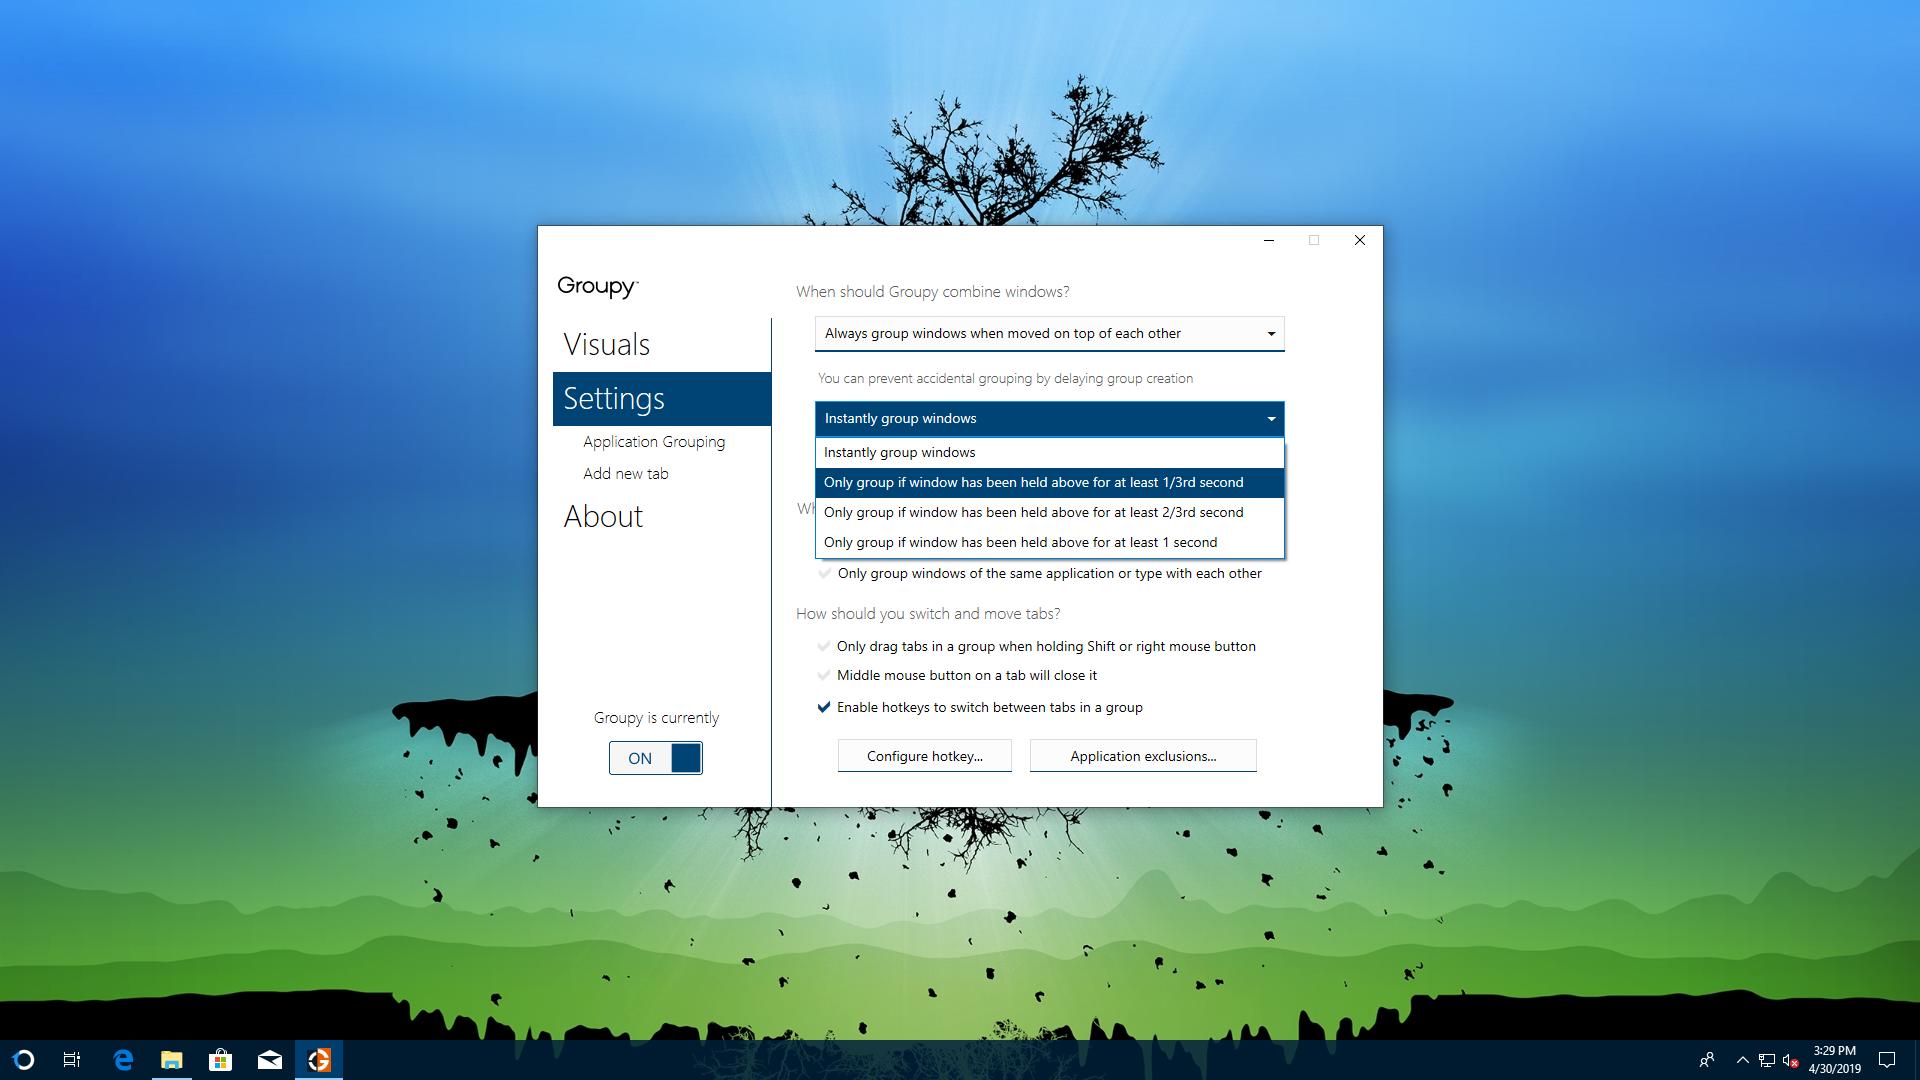 Stardock Releases Groupy v1 2